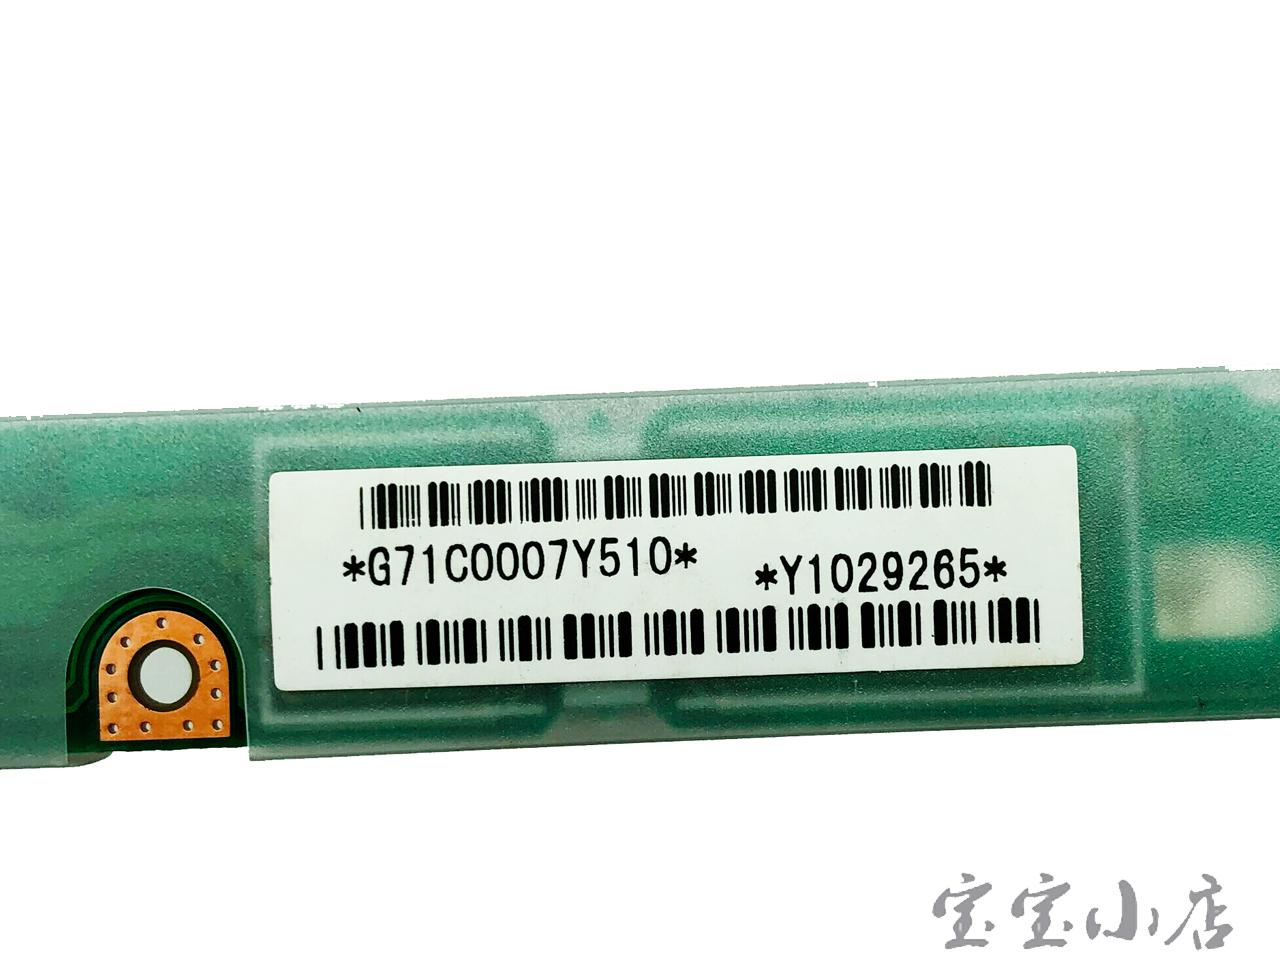 HBL-0366 E-P1-50461 G71C0007Y510 东芝G50 G55 高压条 高压板 逆变器